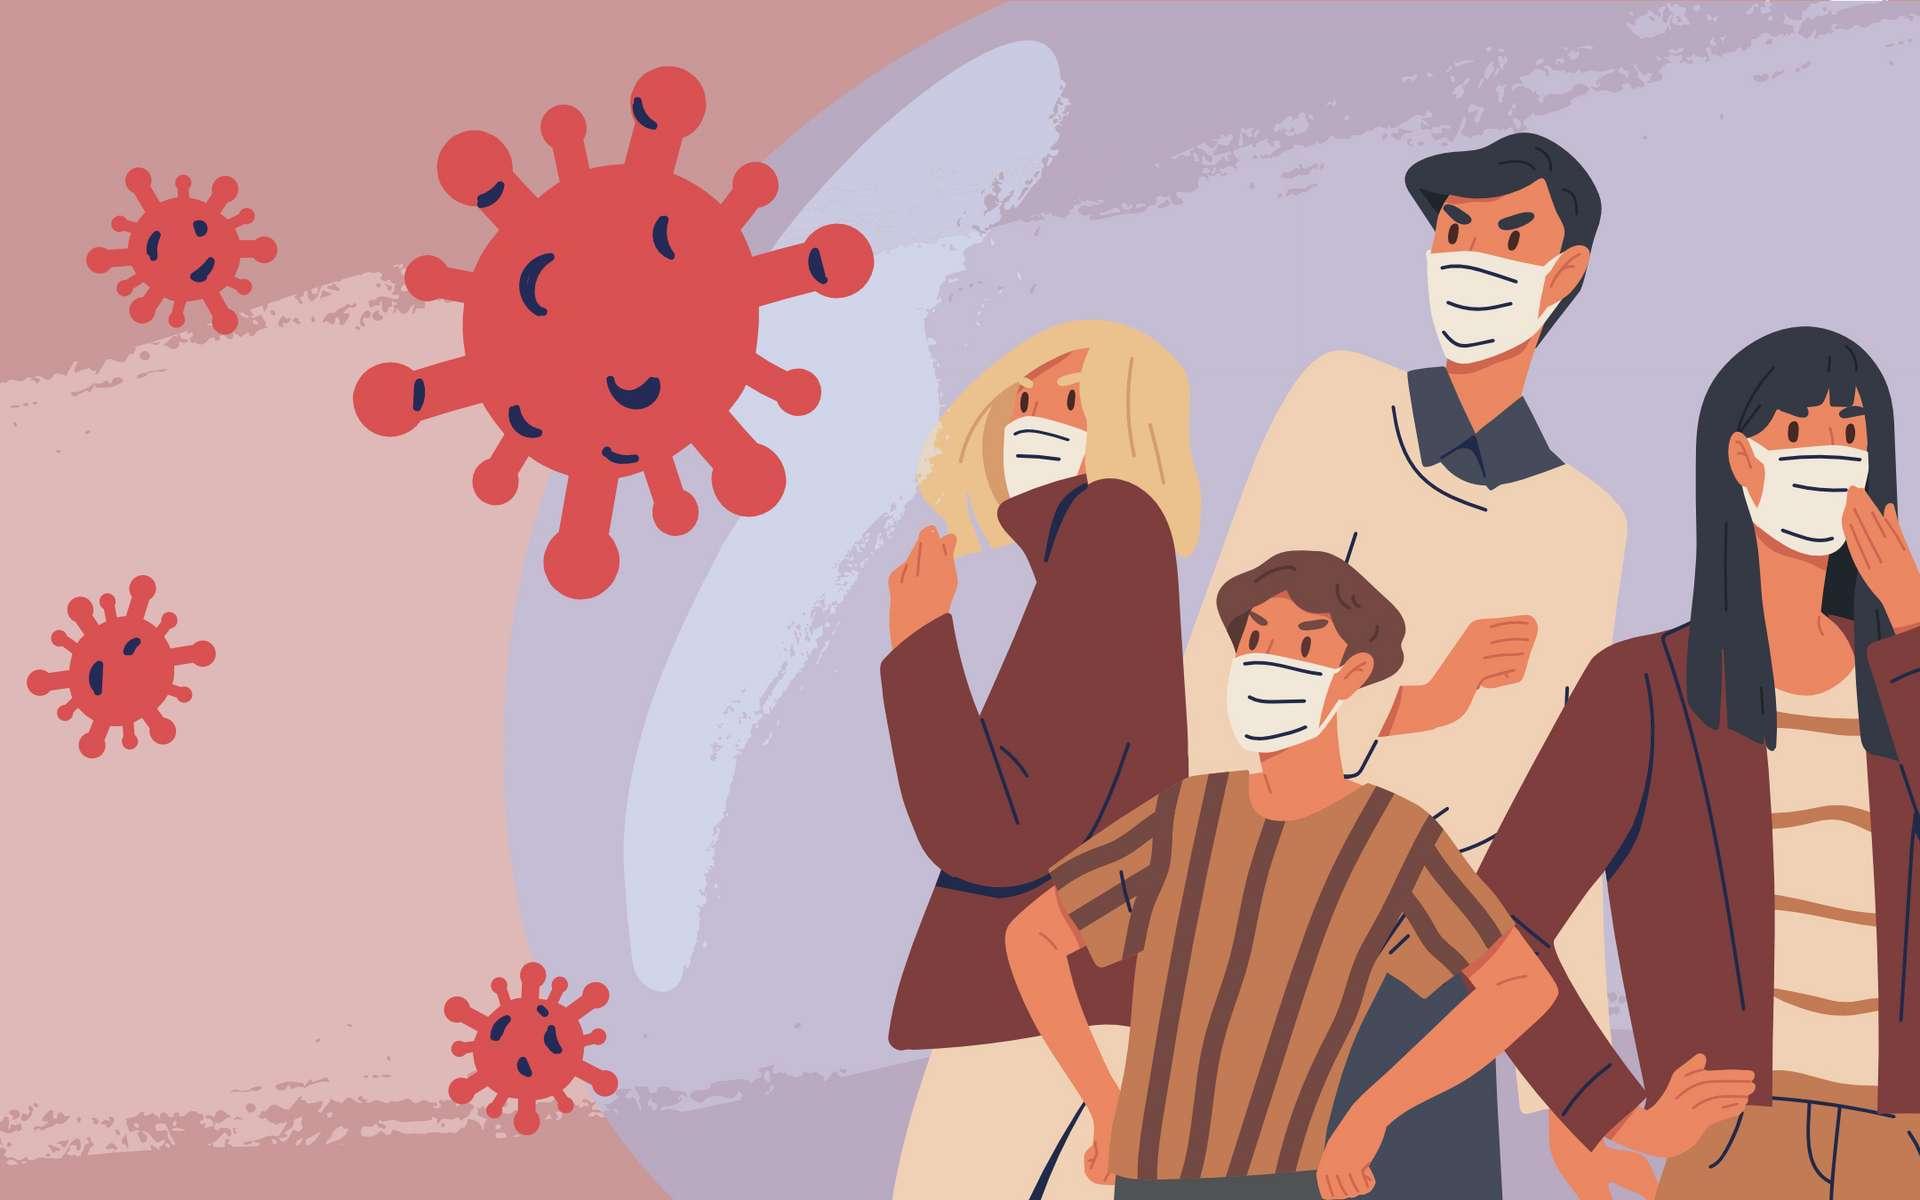 Une personne guérie du coronavirus est-elle immunisée ? © Good Studio, Adobe Stock